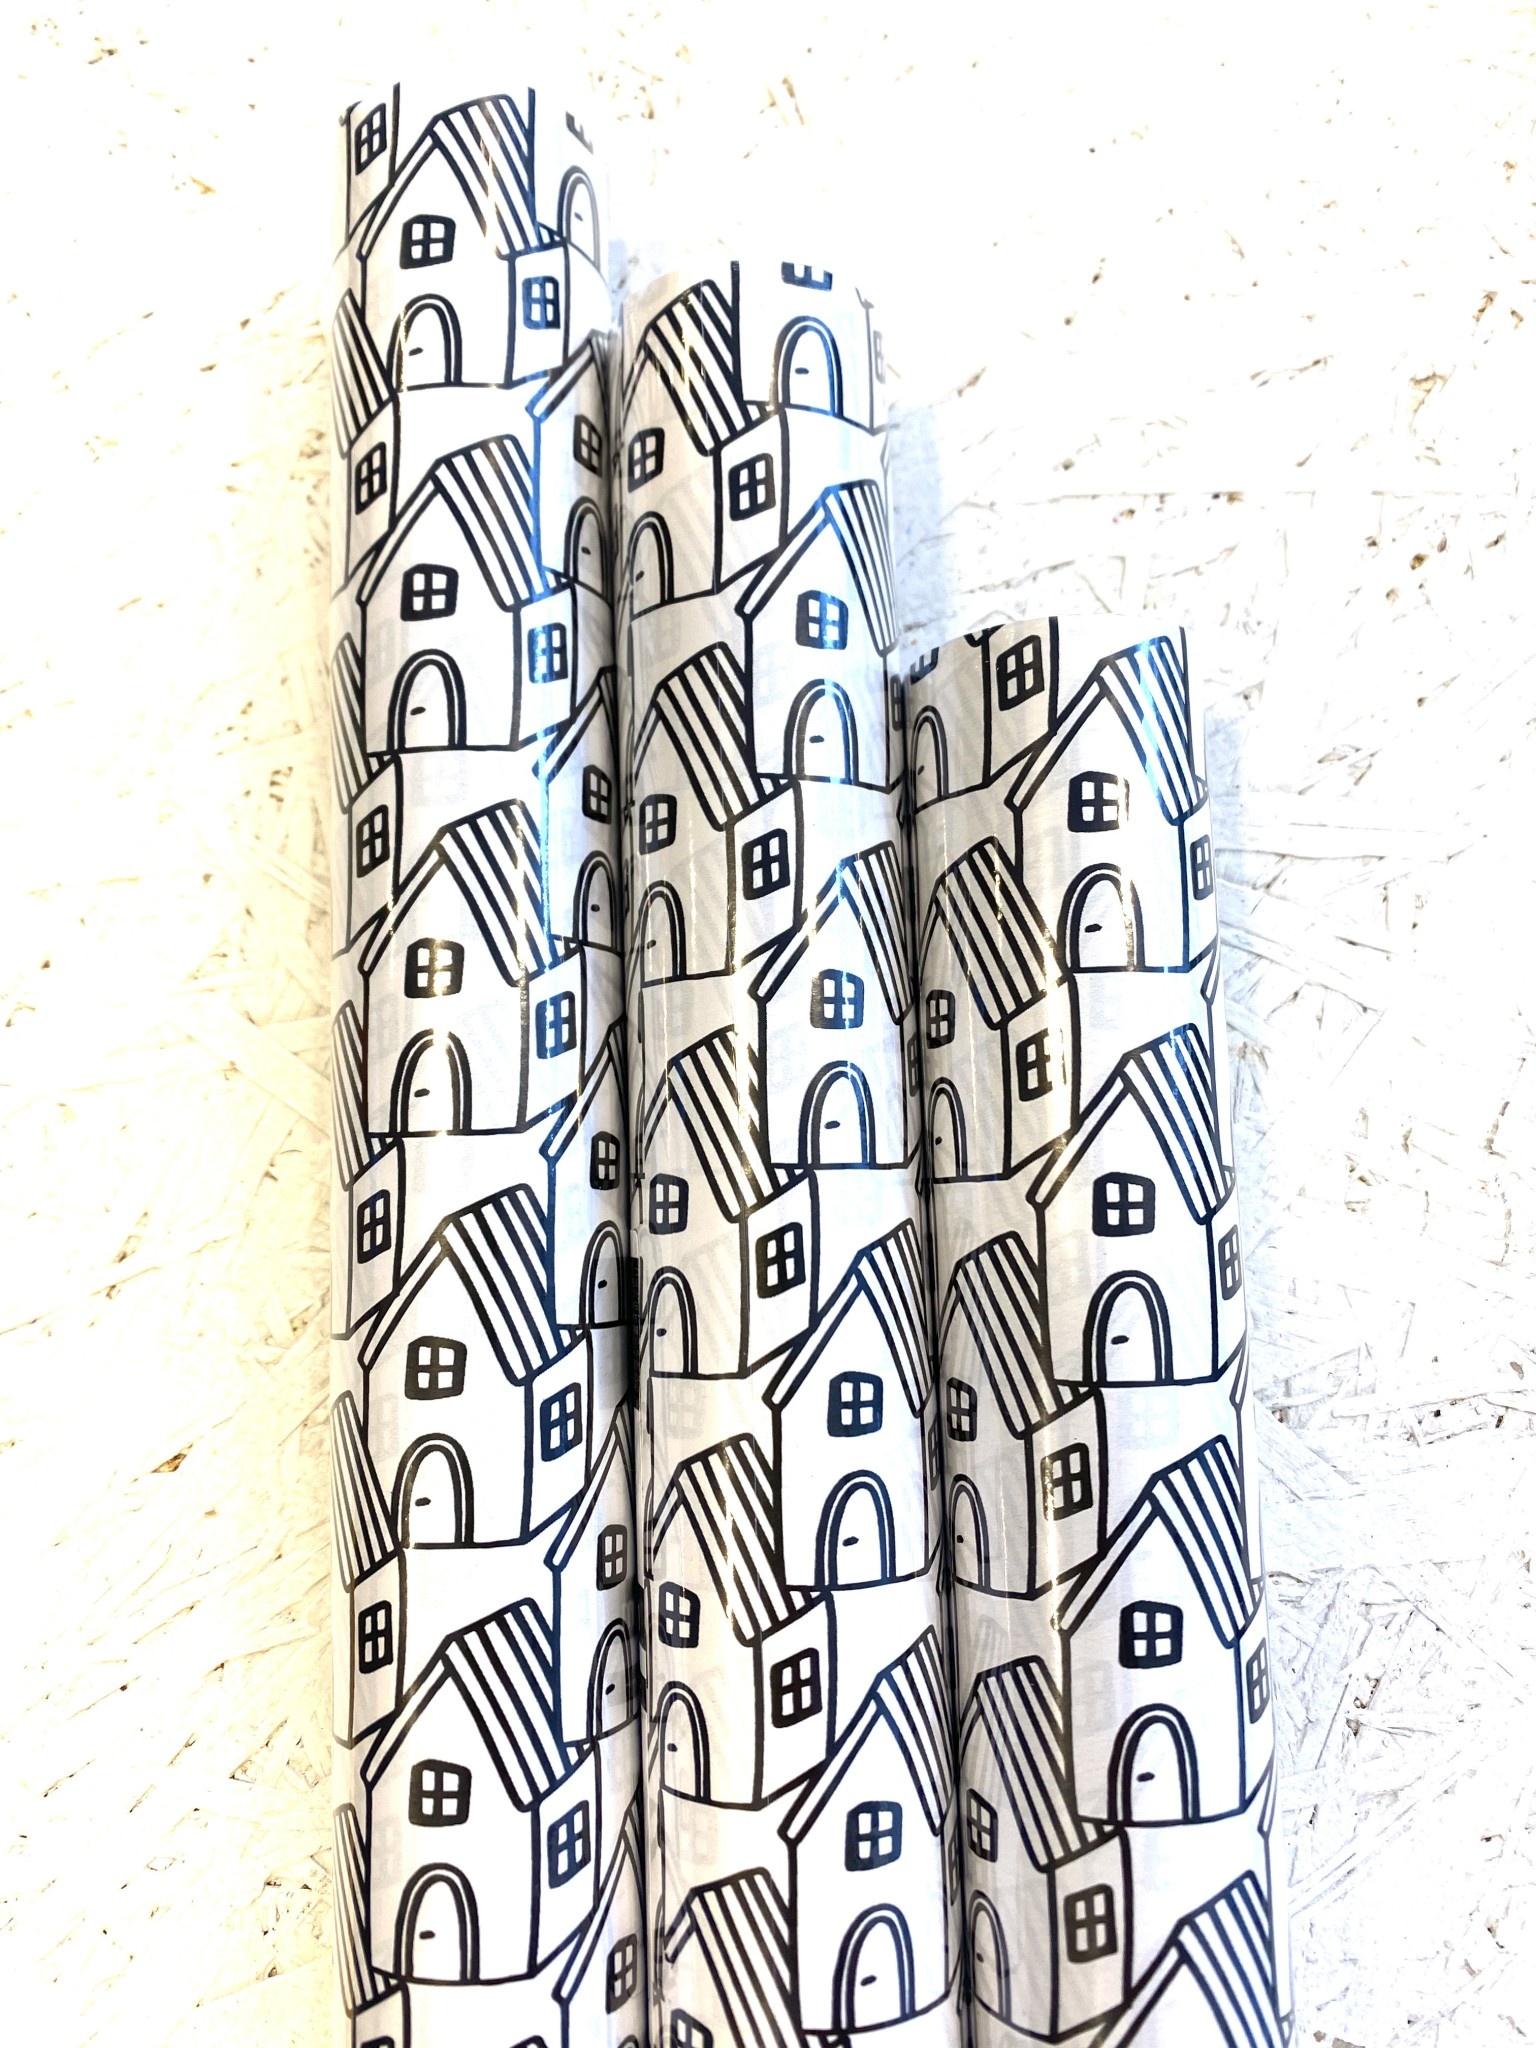 Inpakpapier Zwart-Wit Huis-1